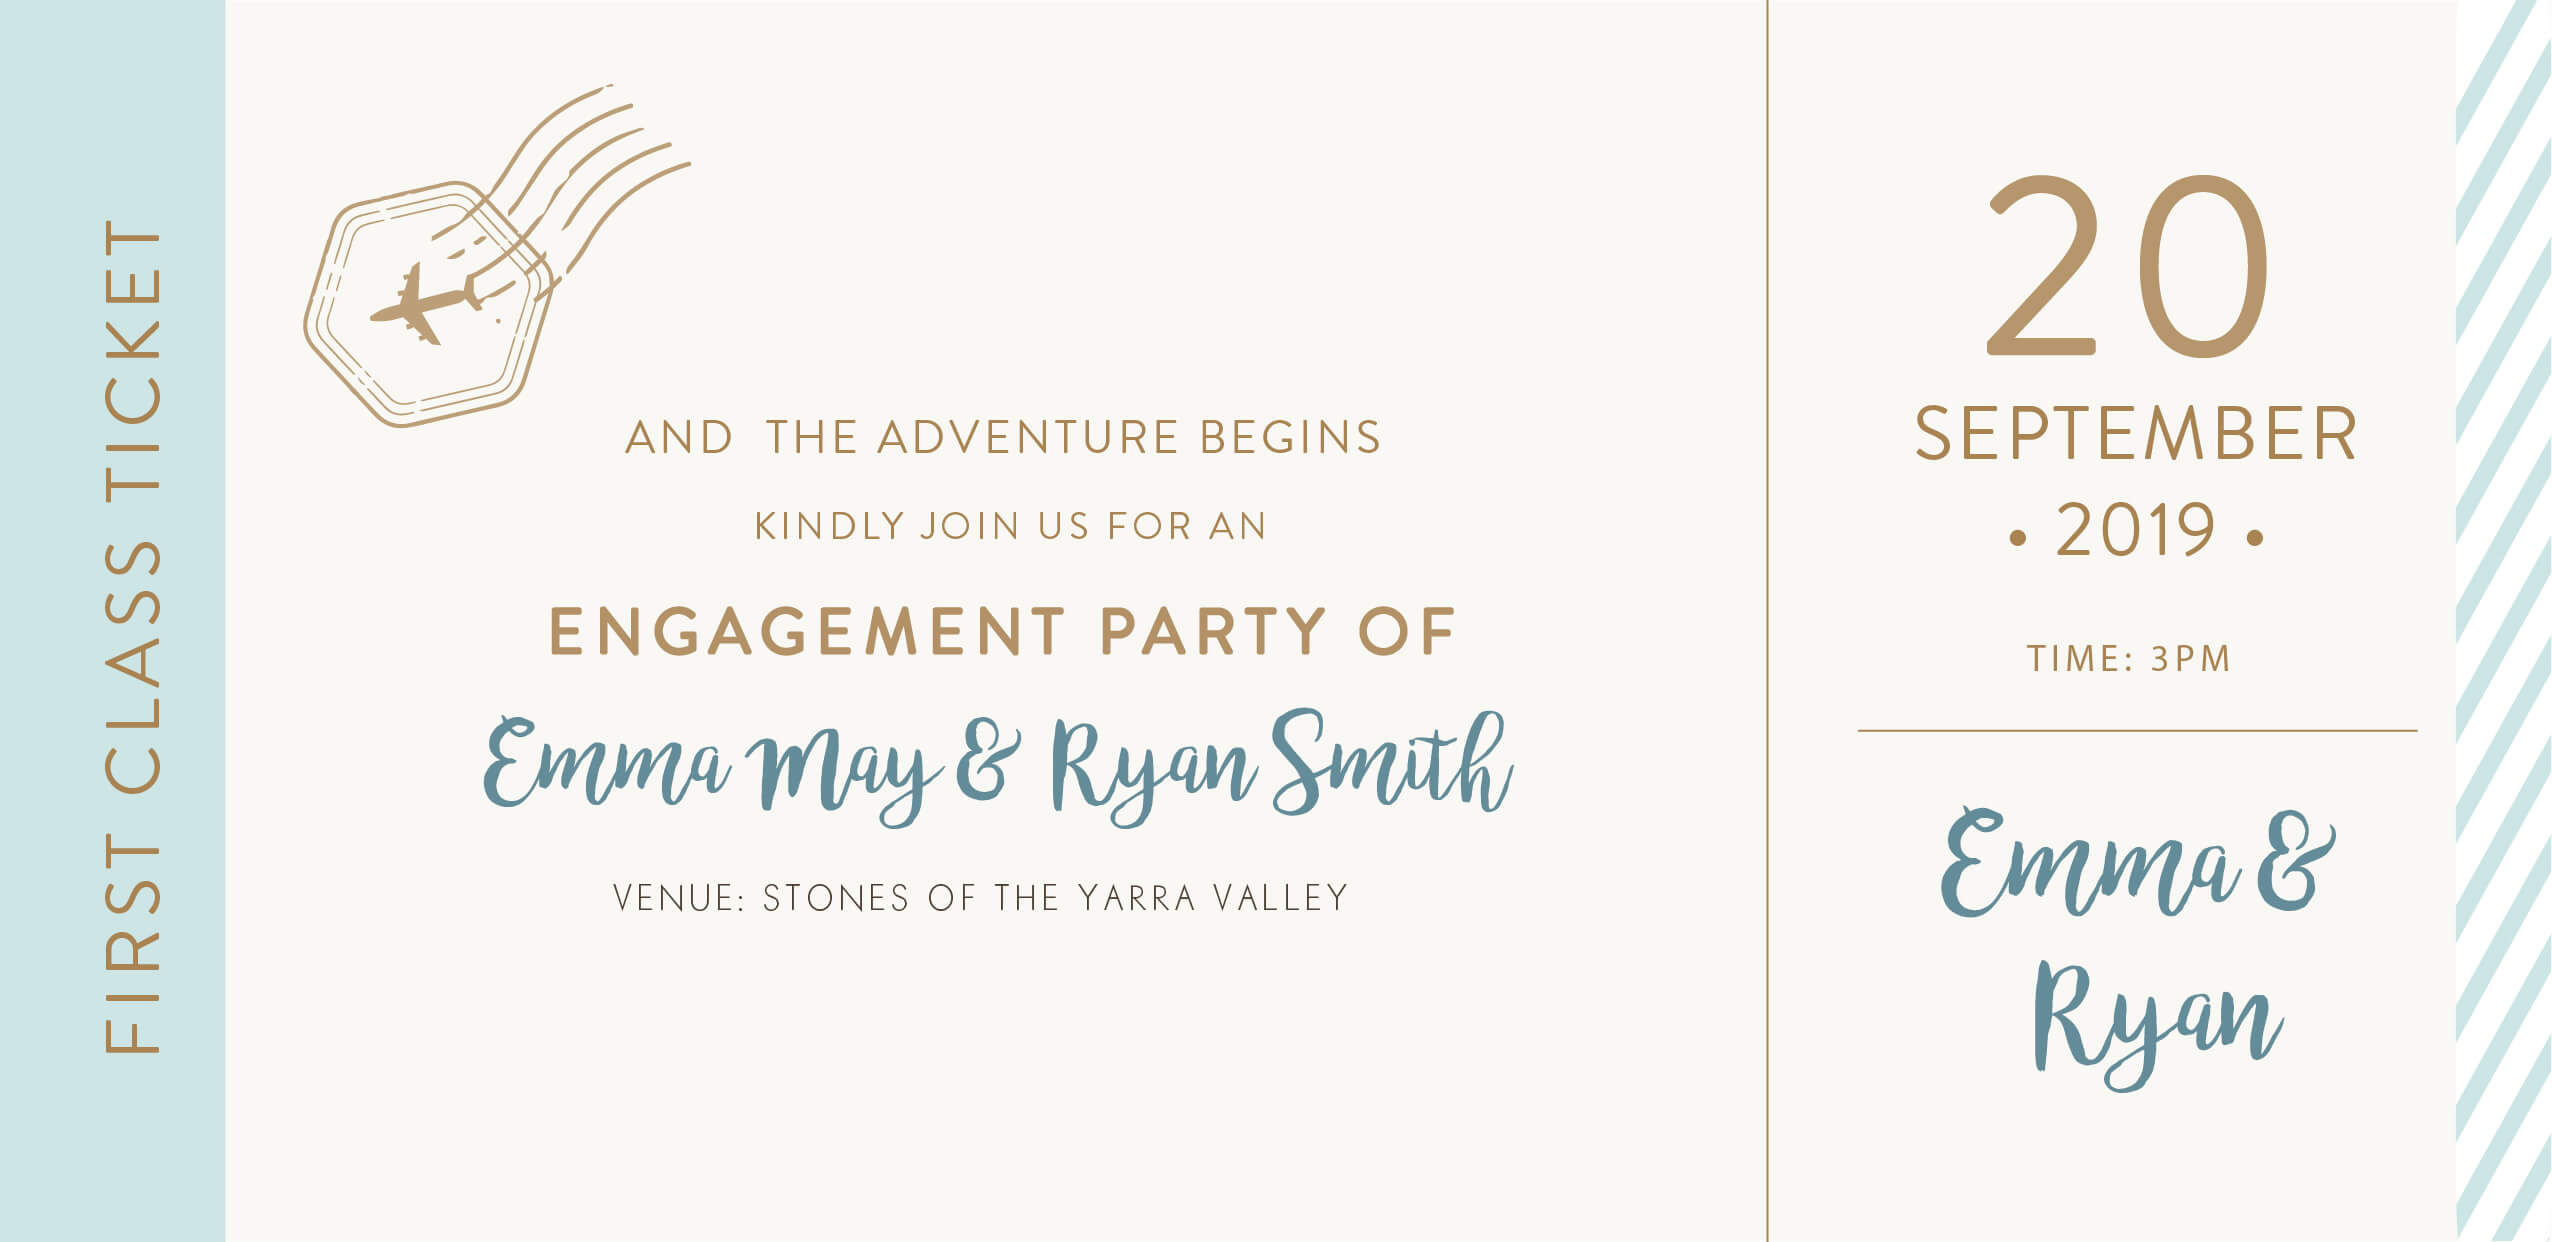 Lets Travel Together - Engagement Invitations